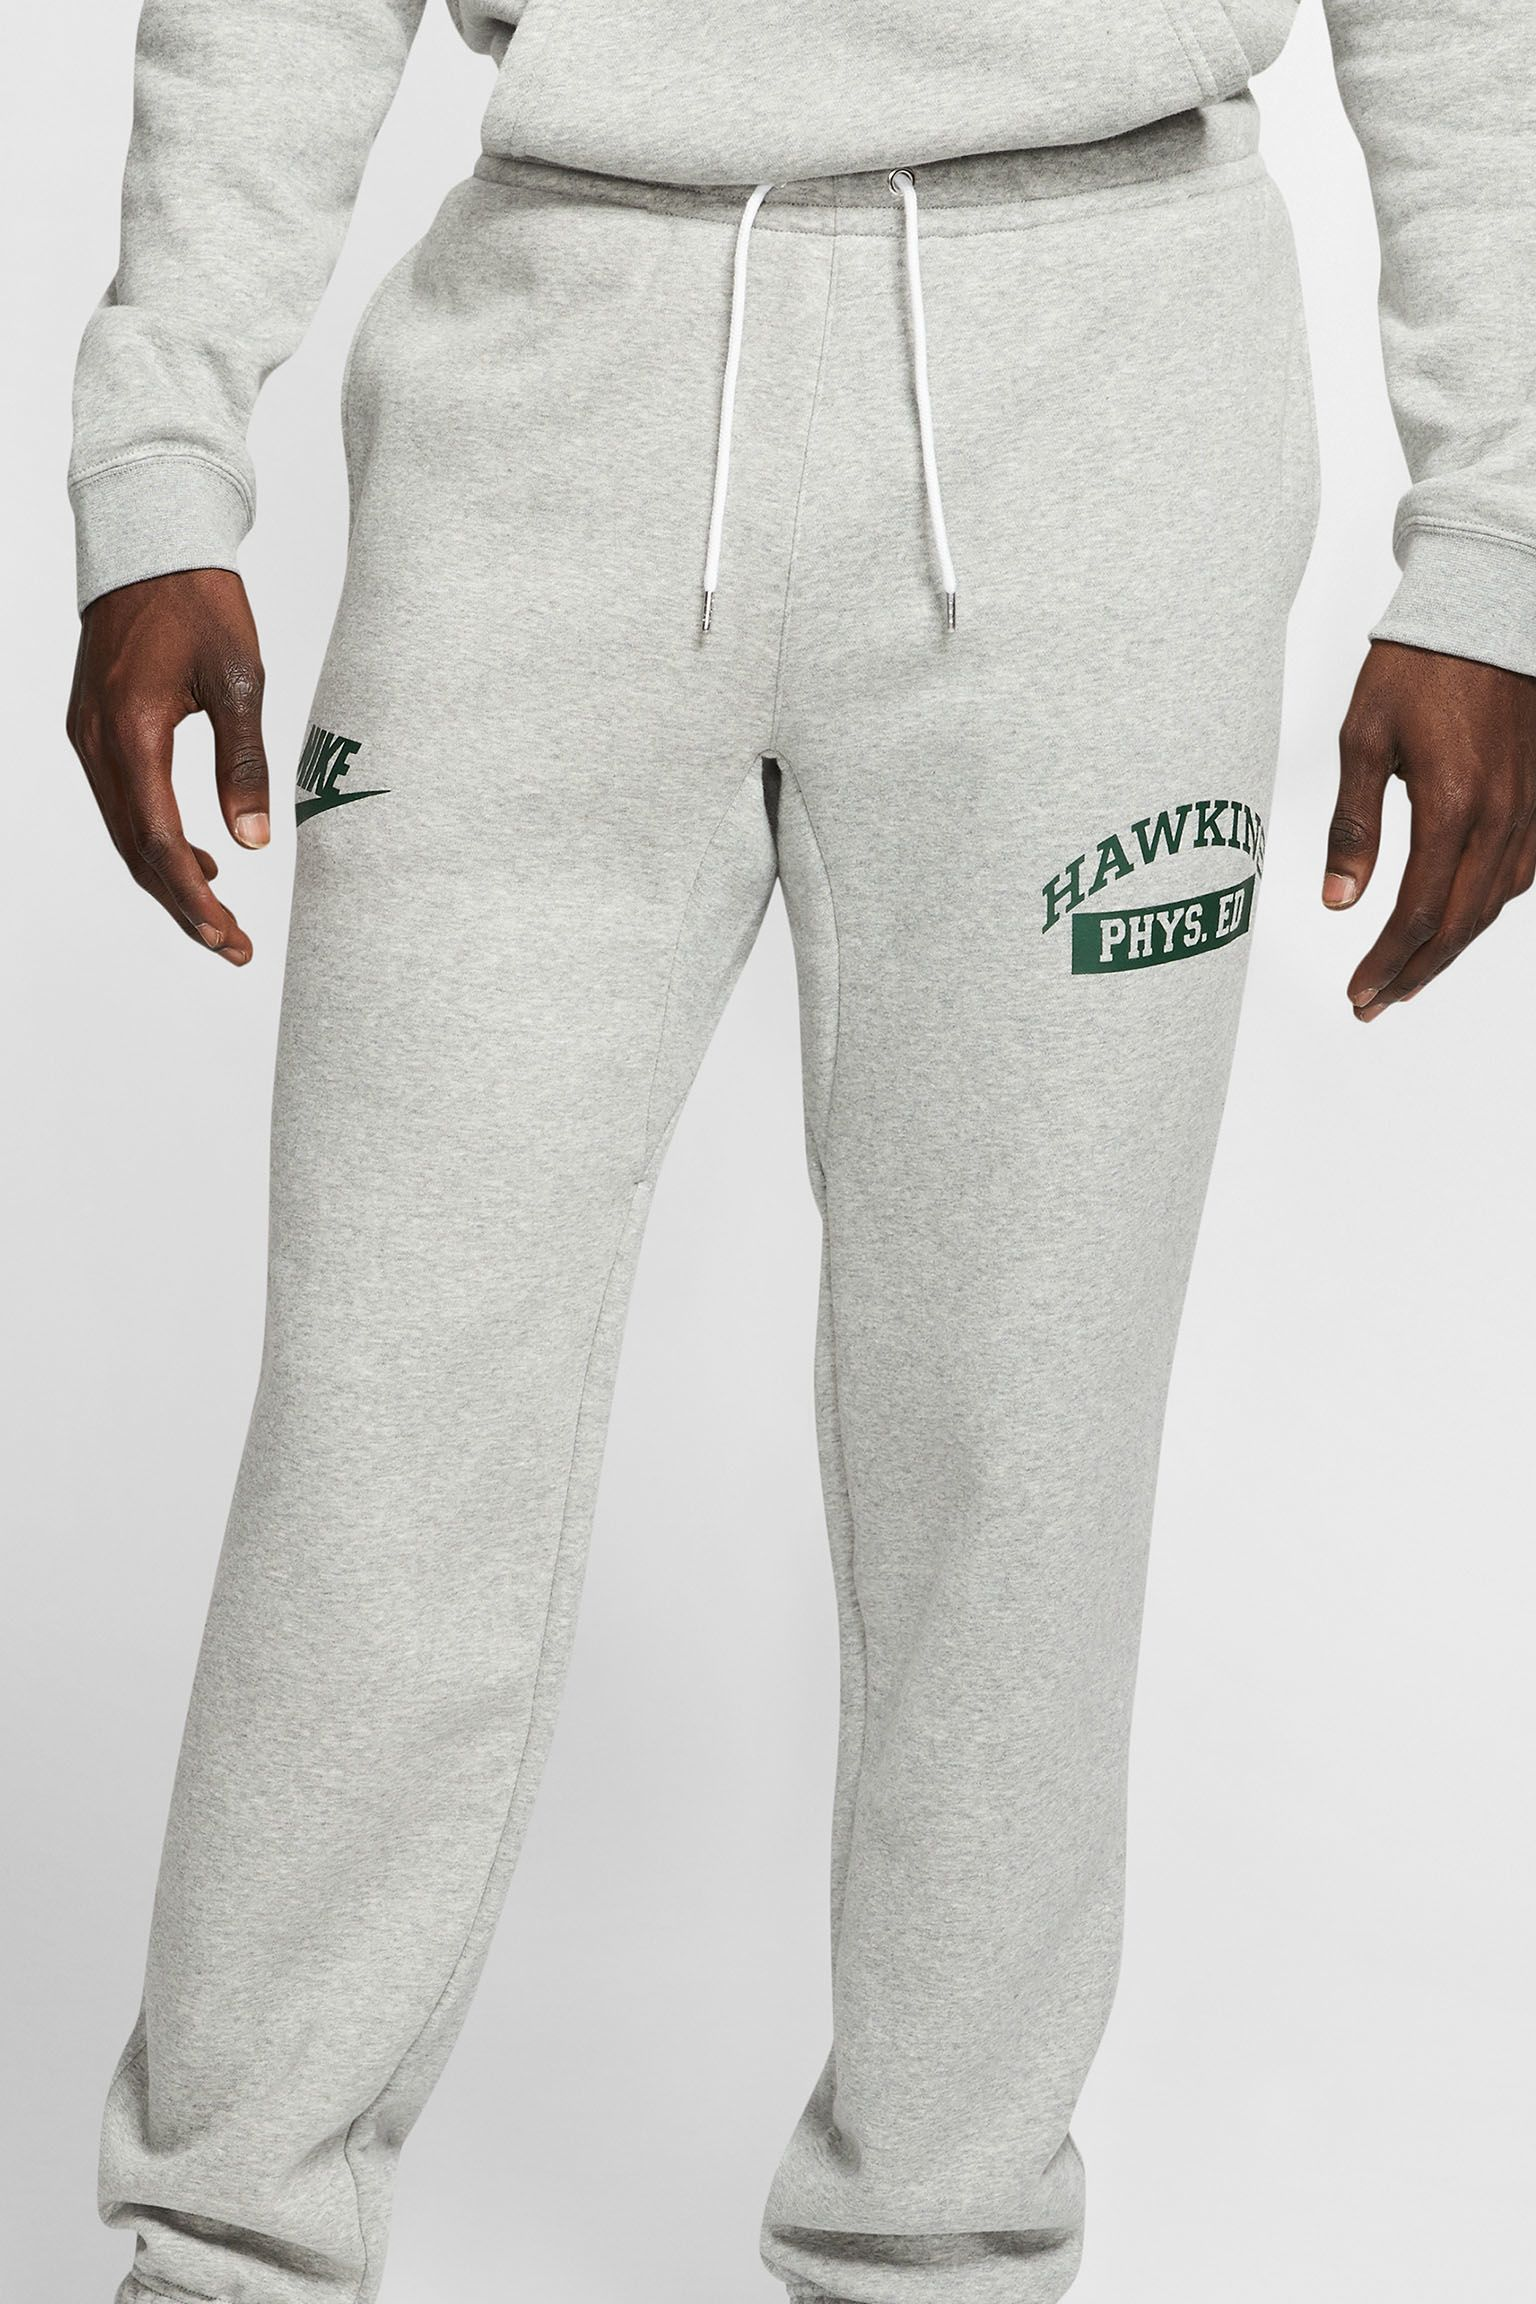 Nike x Stranger Things Cortez Cortez 'Hawkins High' Release Date